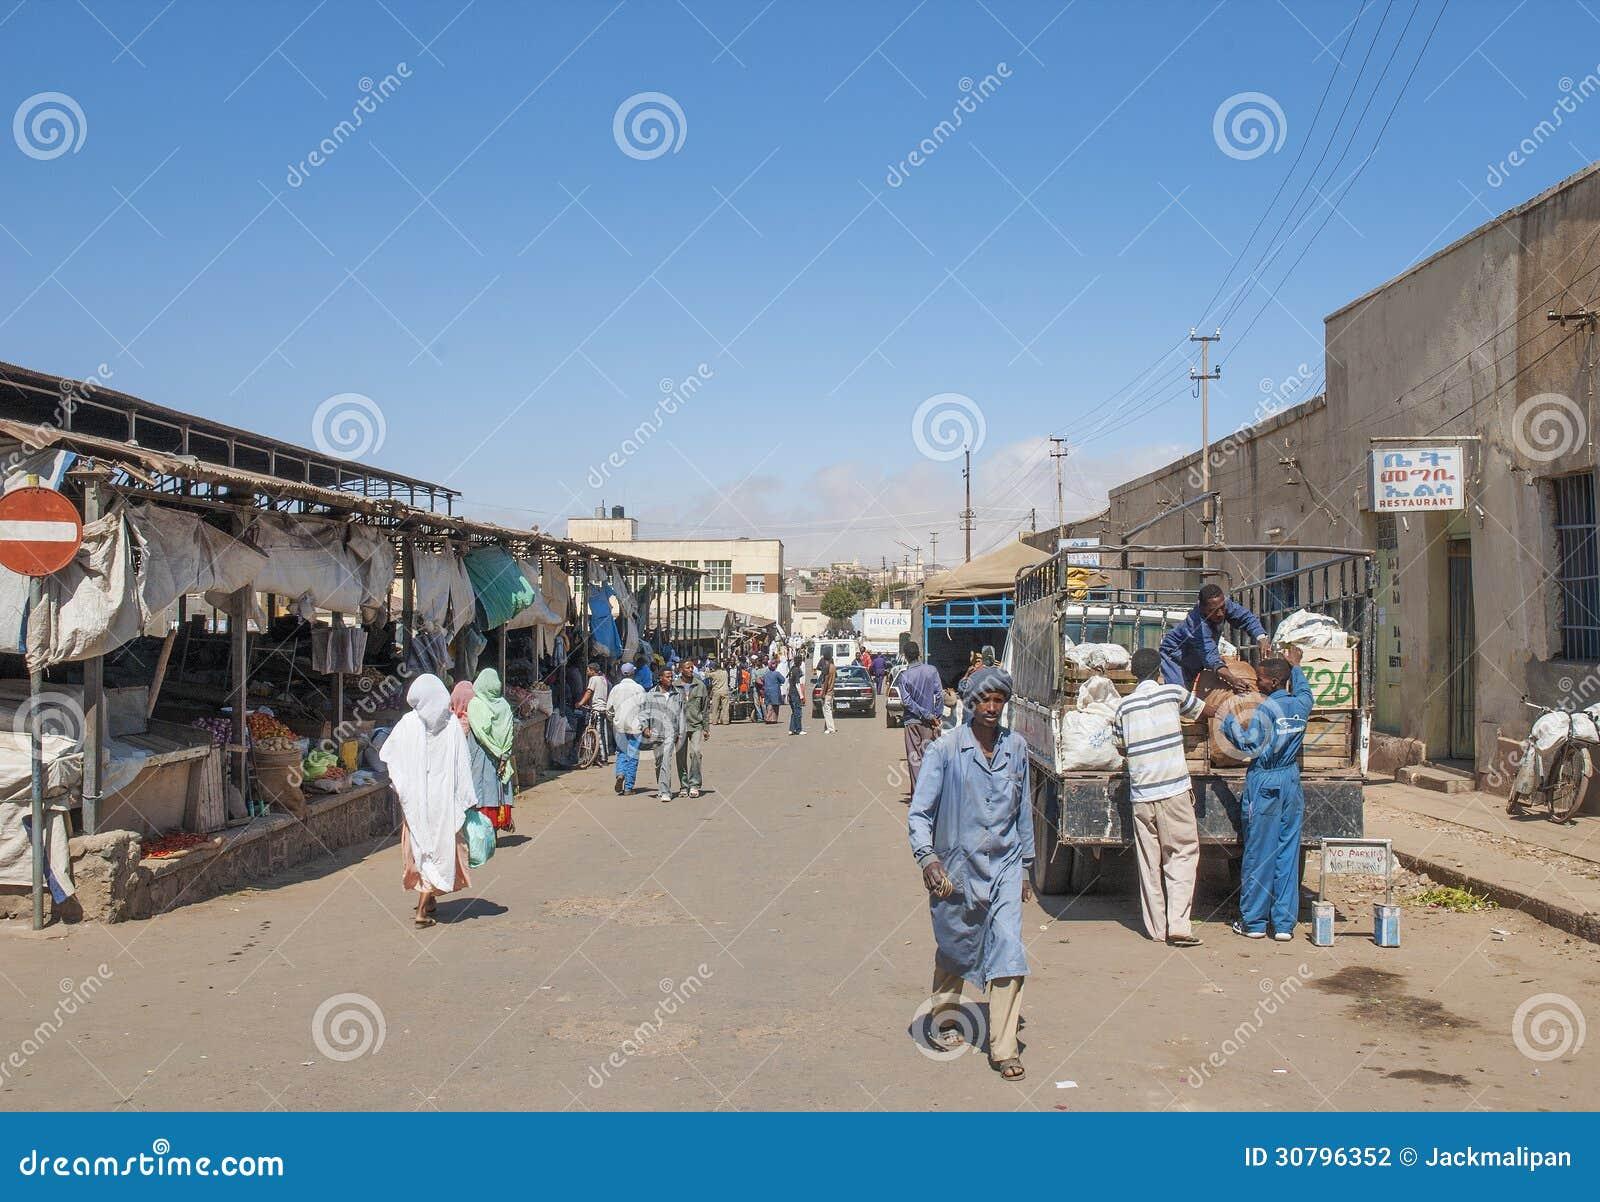 market street in asmara eritrea editorial photography image of